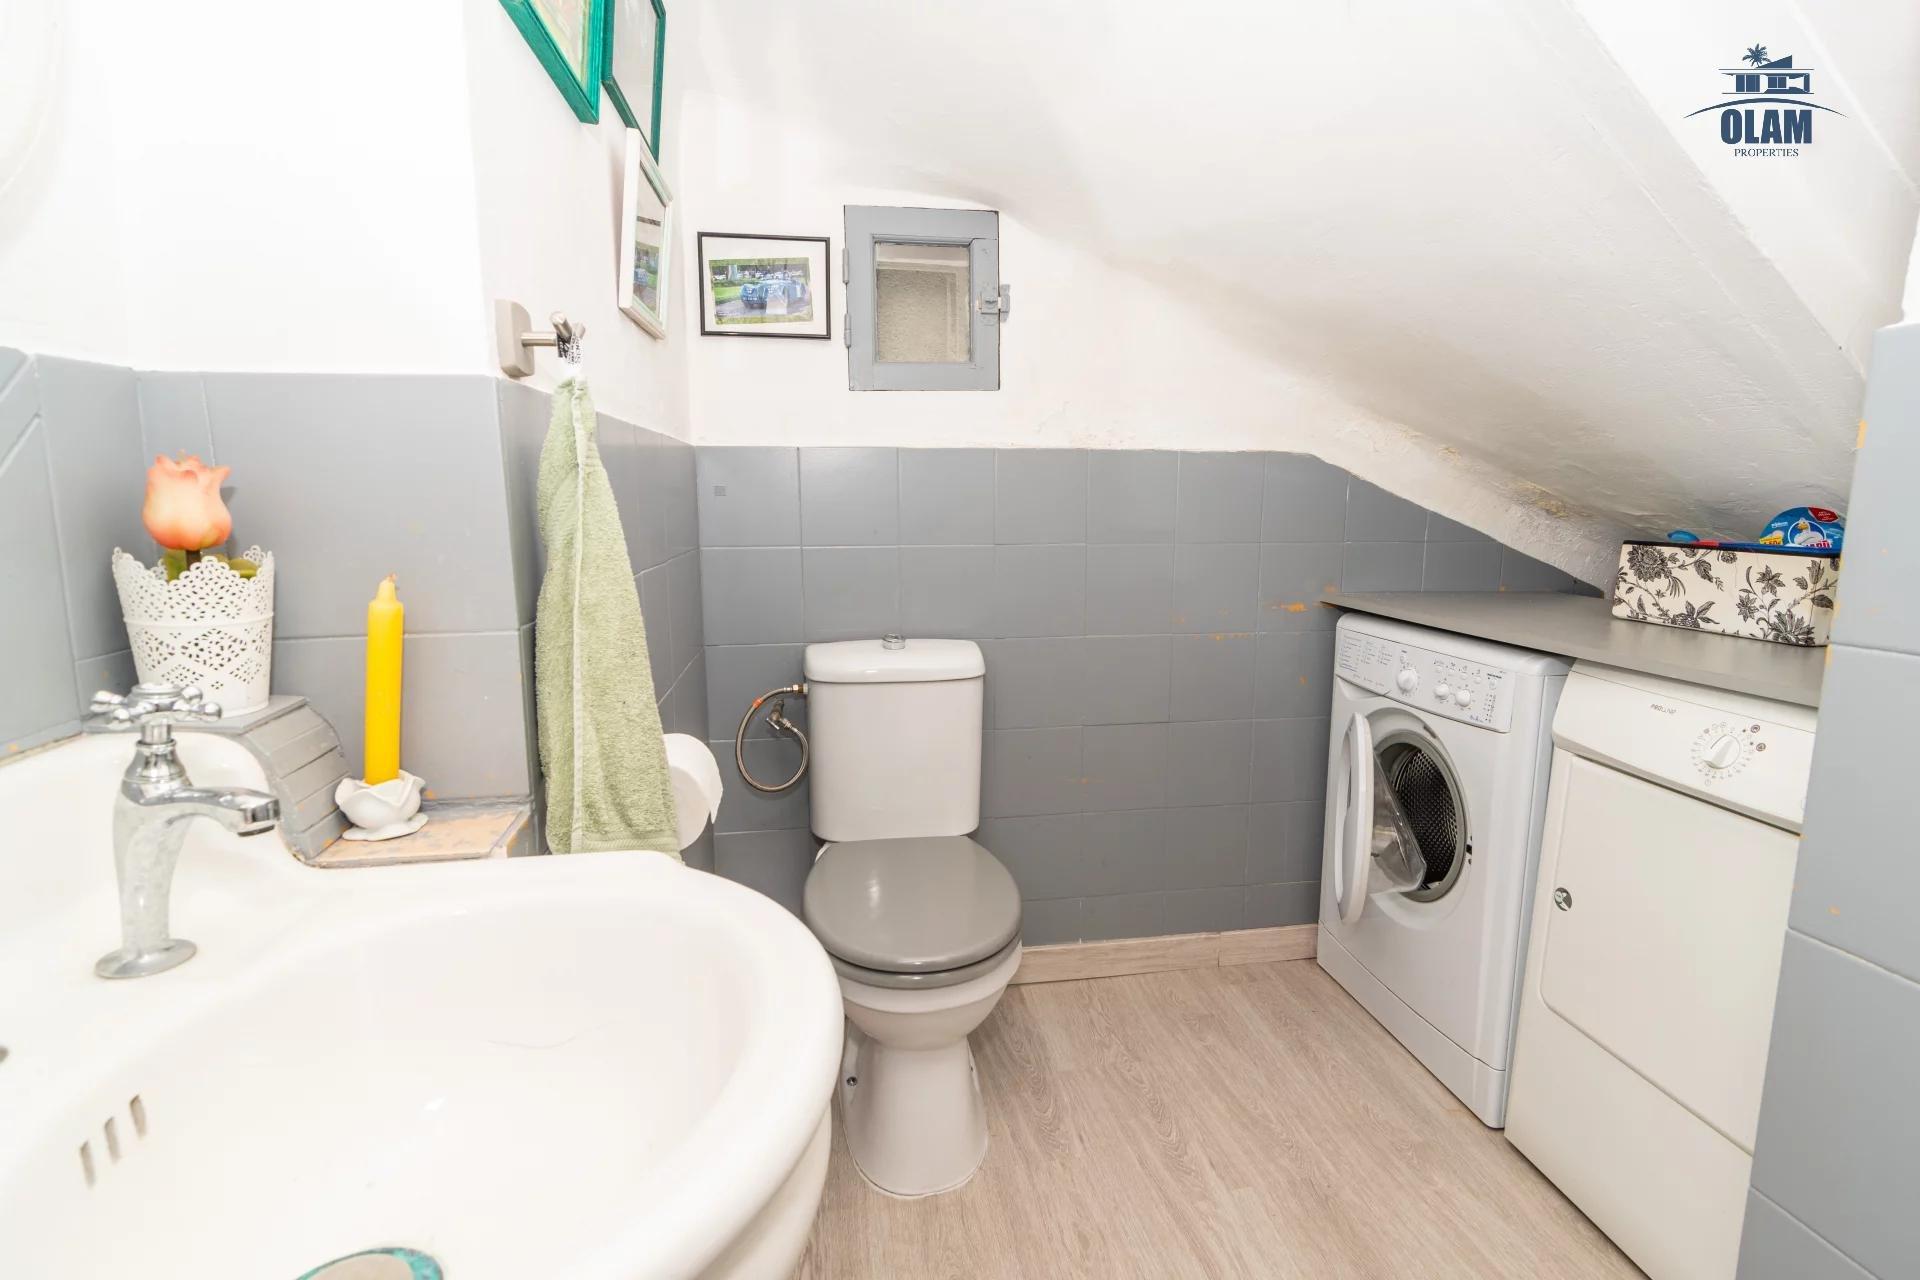 Superbe Maison 3 chambres 3 bains